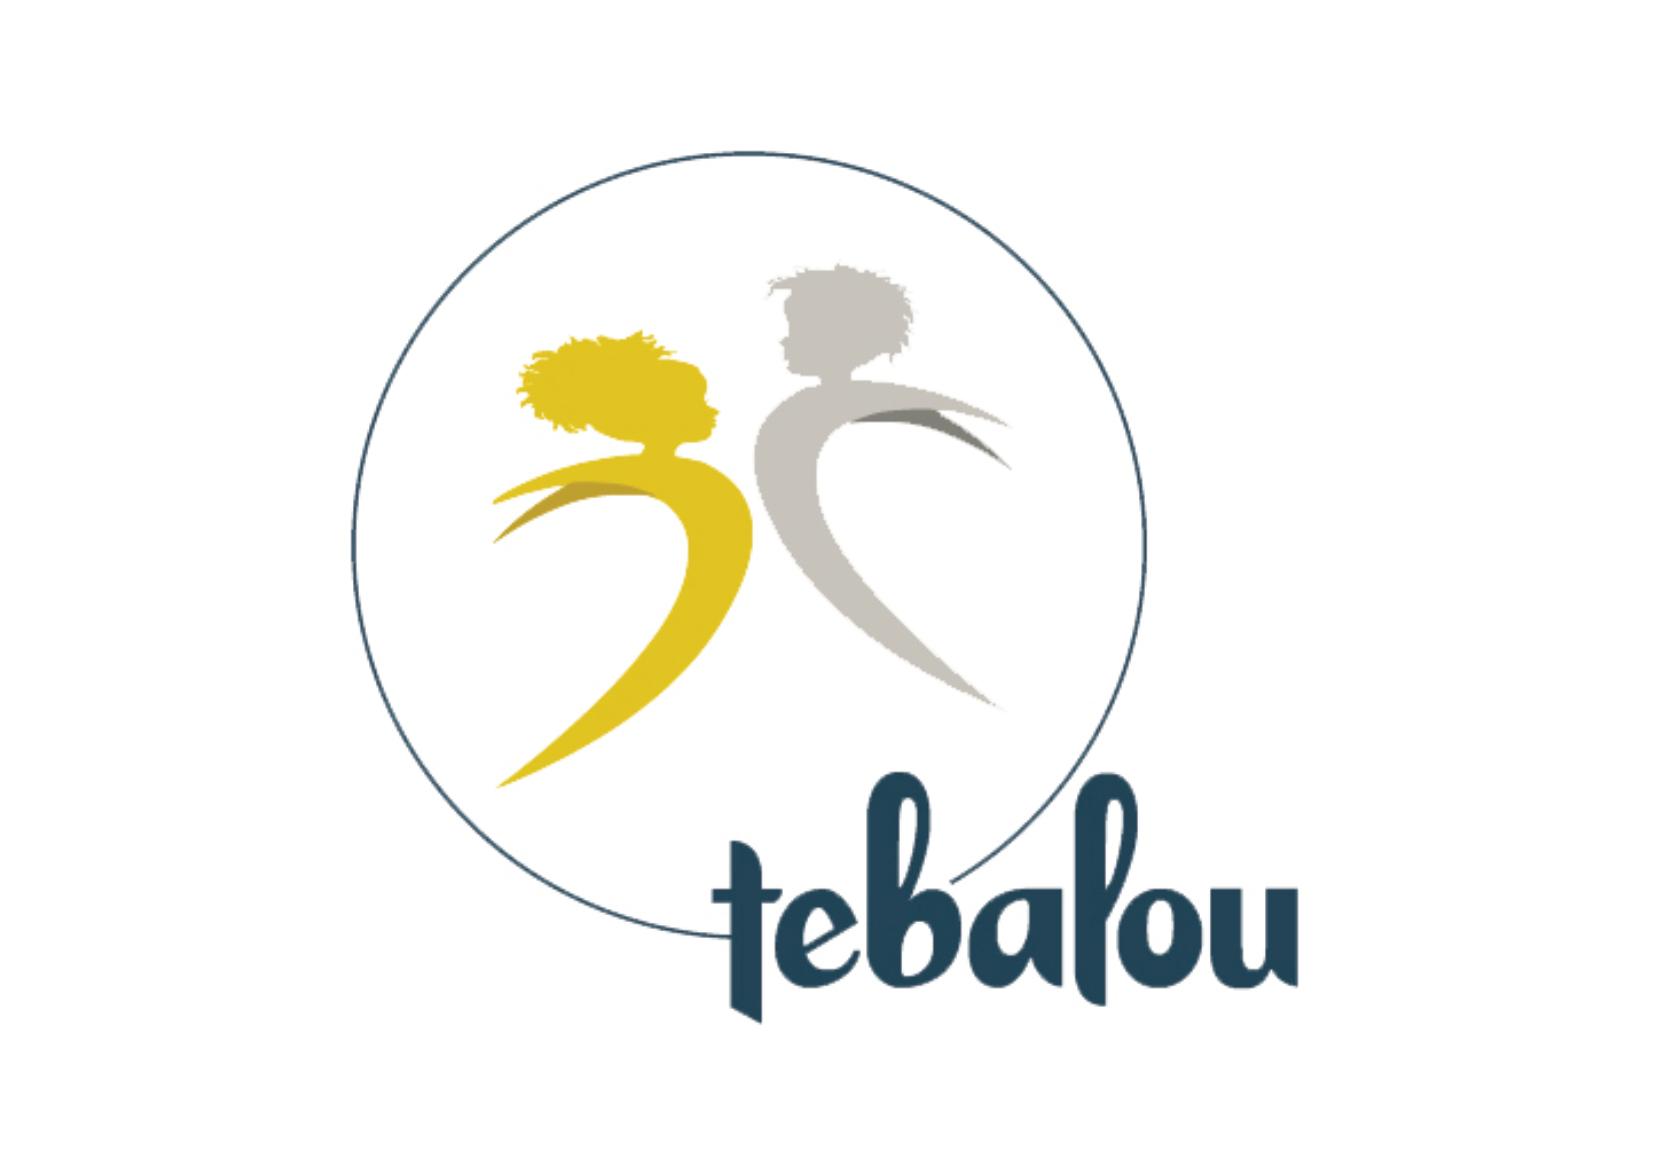 Tebalou